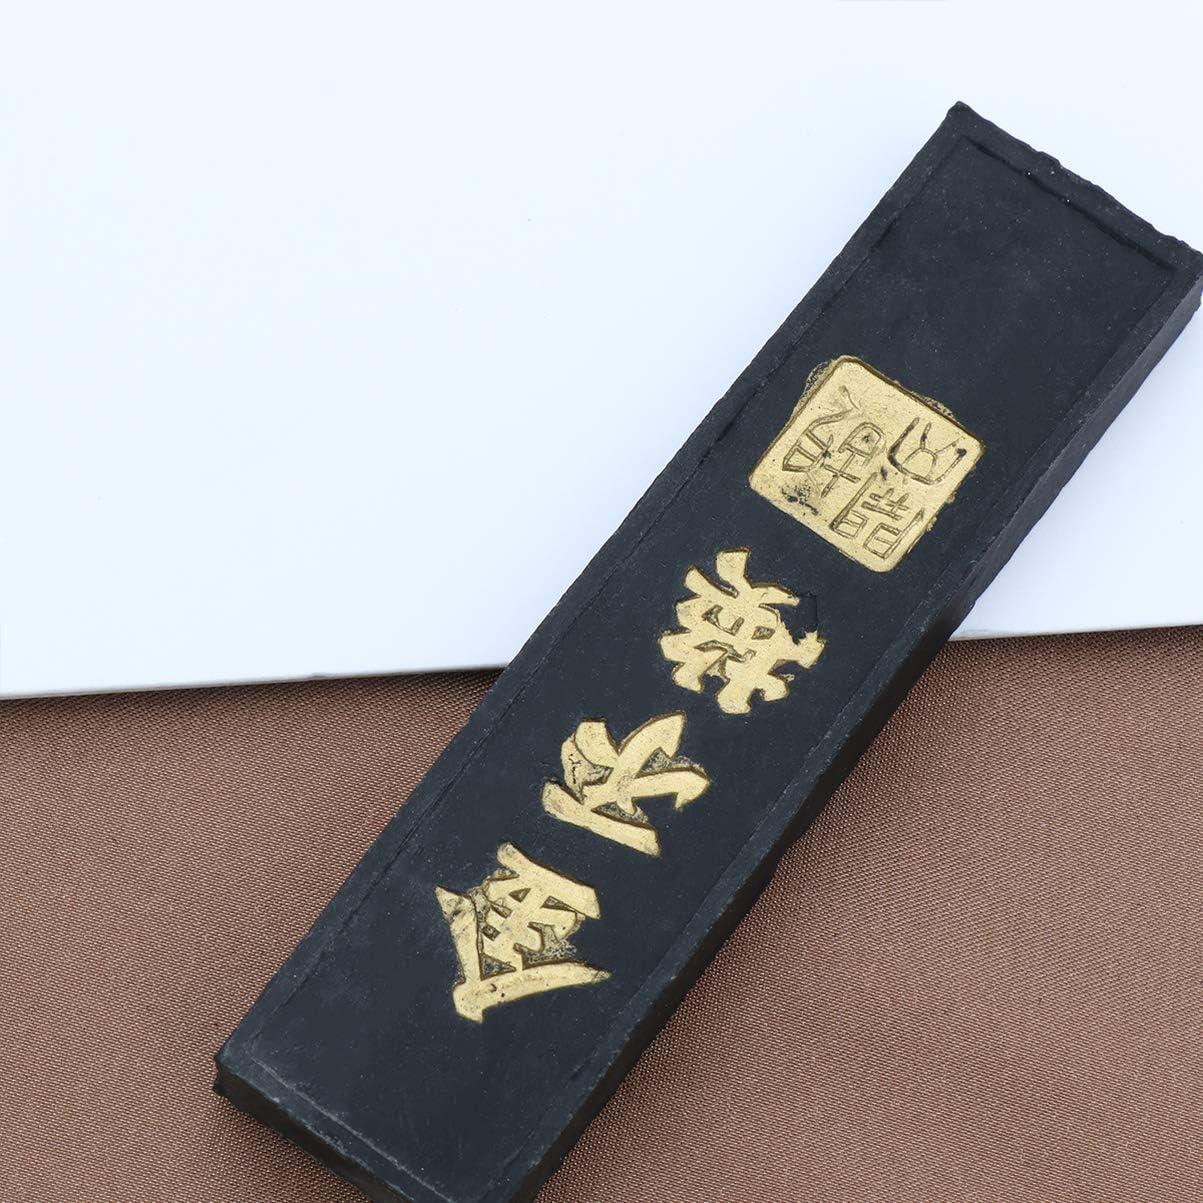 SUPVOX Ink Block Ink Stick Chinese Calligraphy Ink Stone Ink Stone for Japanese Calligraphy Painting Supplies Black